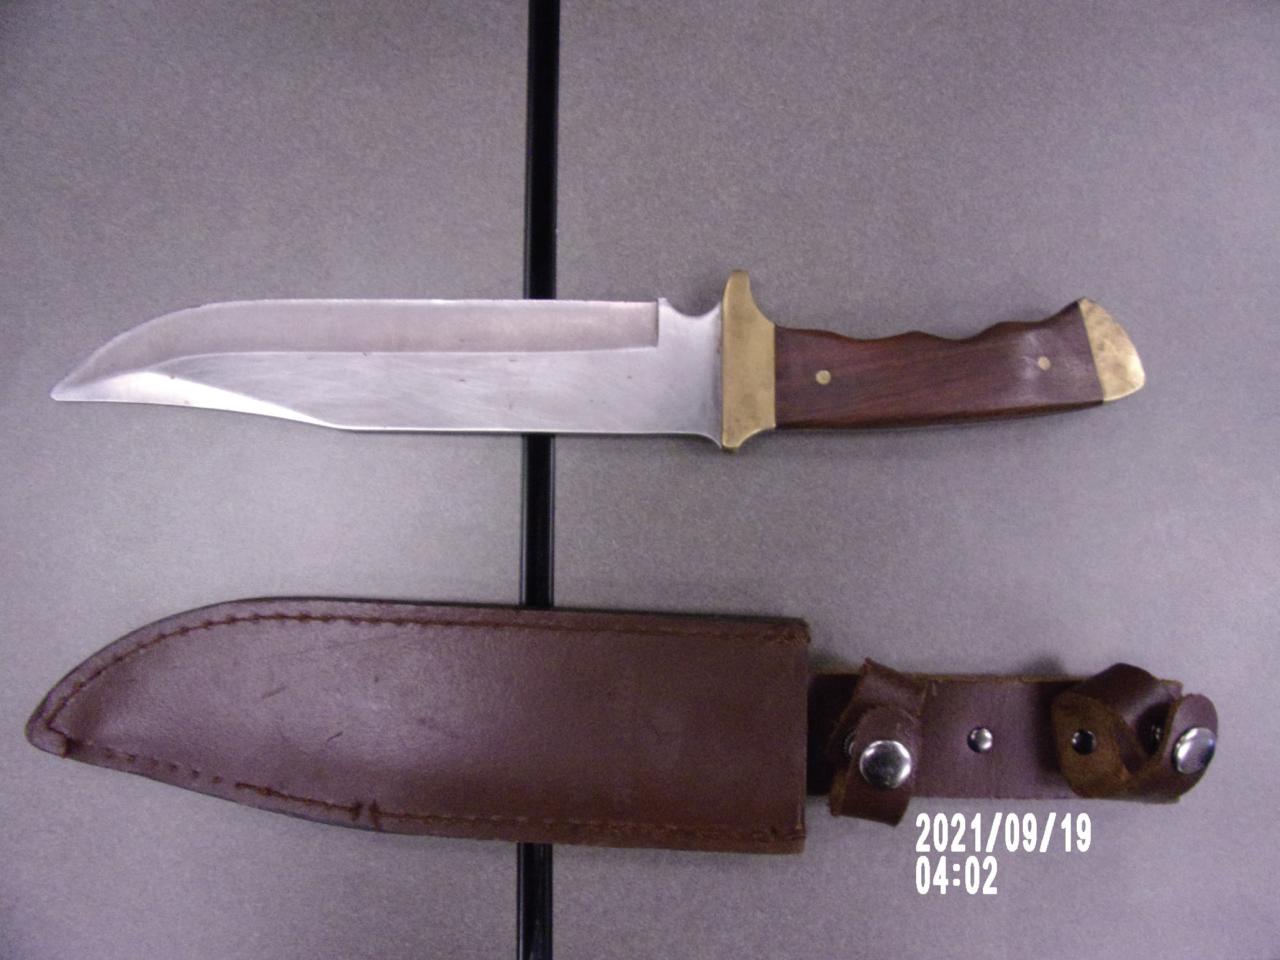 Bowieknife.png